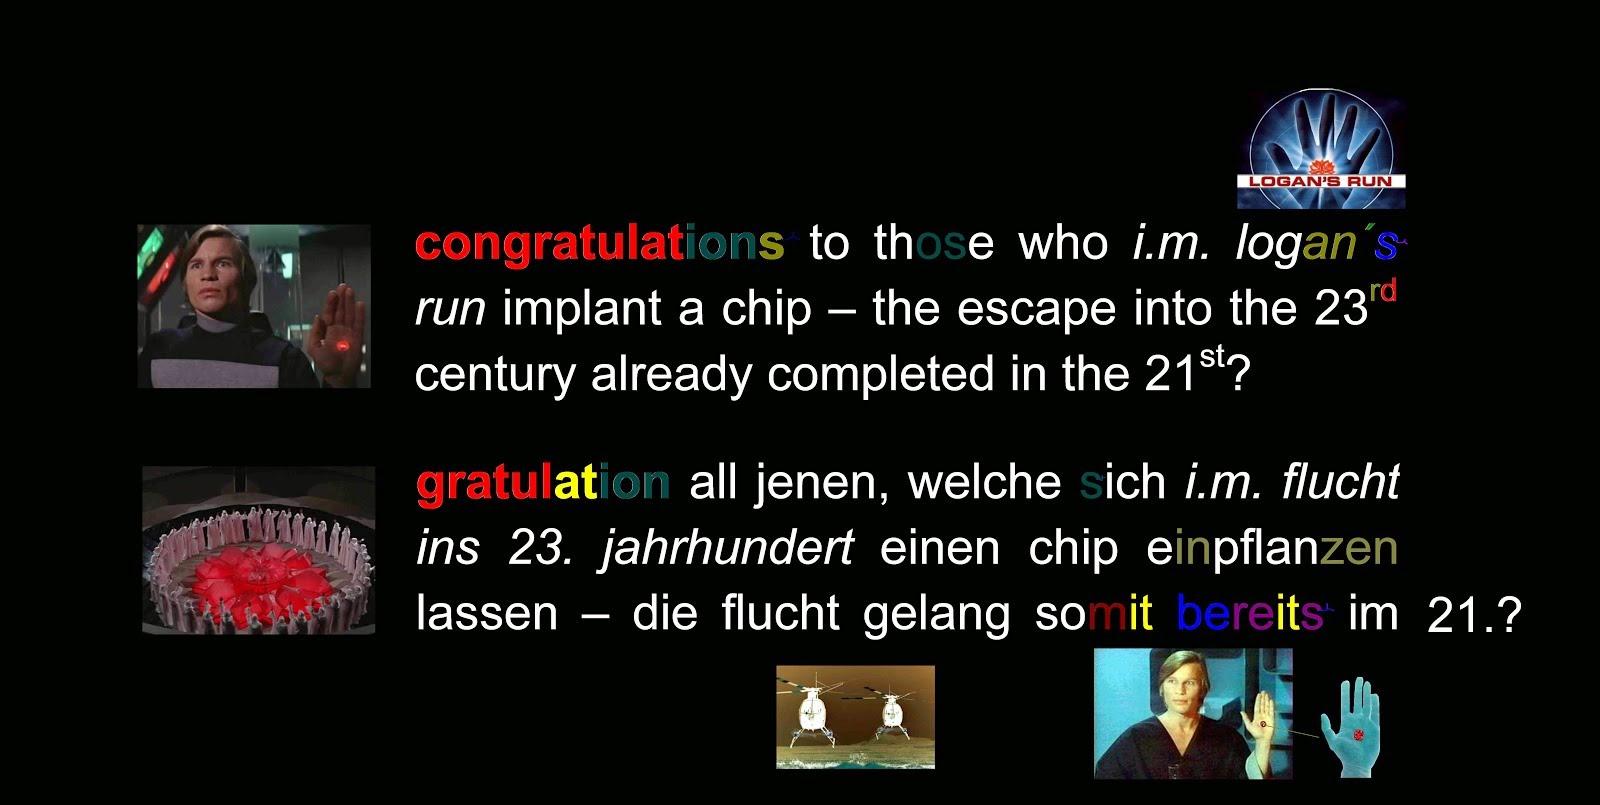 logan´s run chip implanting image by mischa vetere hindered february 2015 in berlin bnd merkel gens